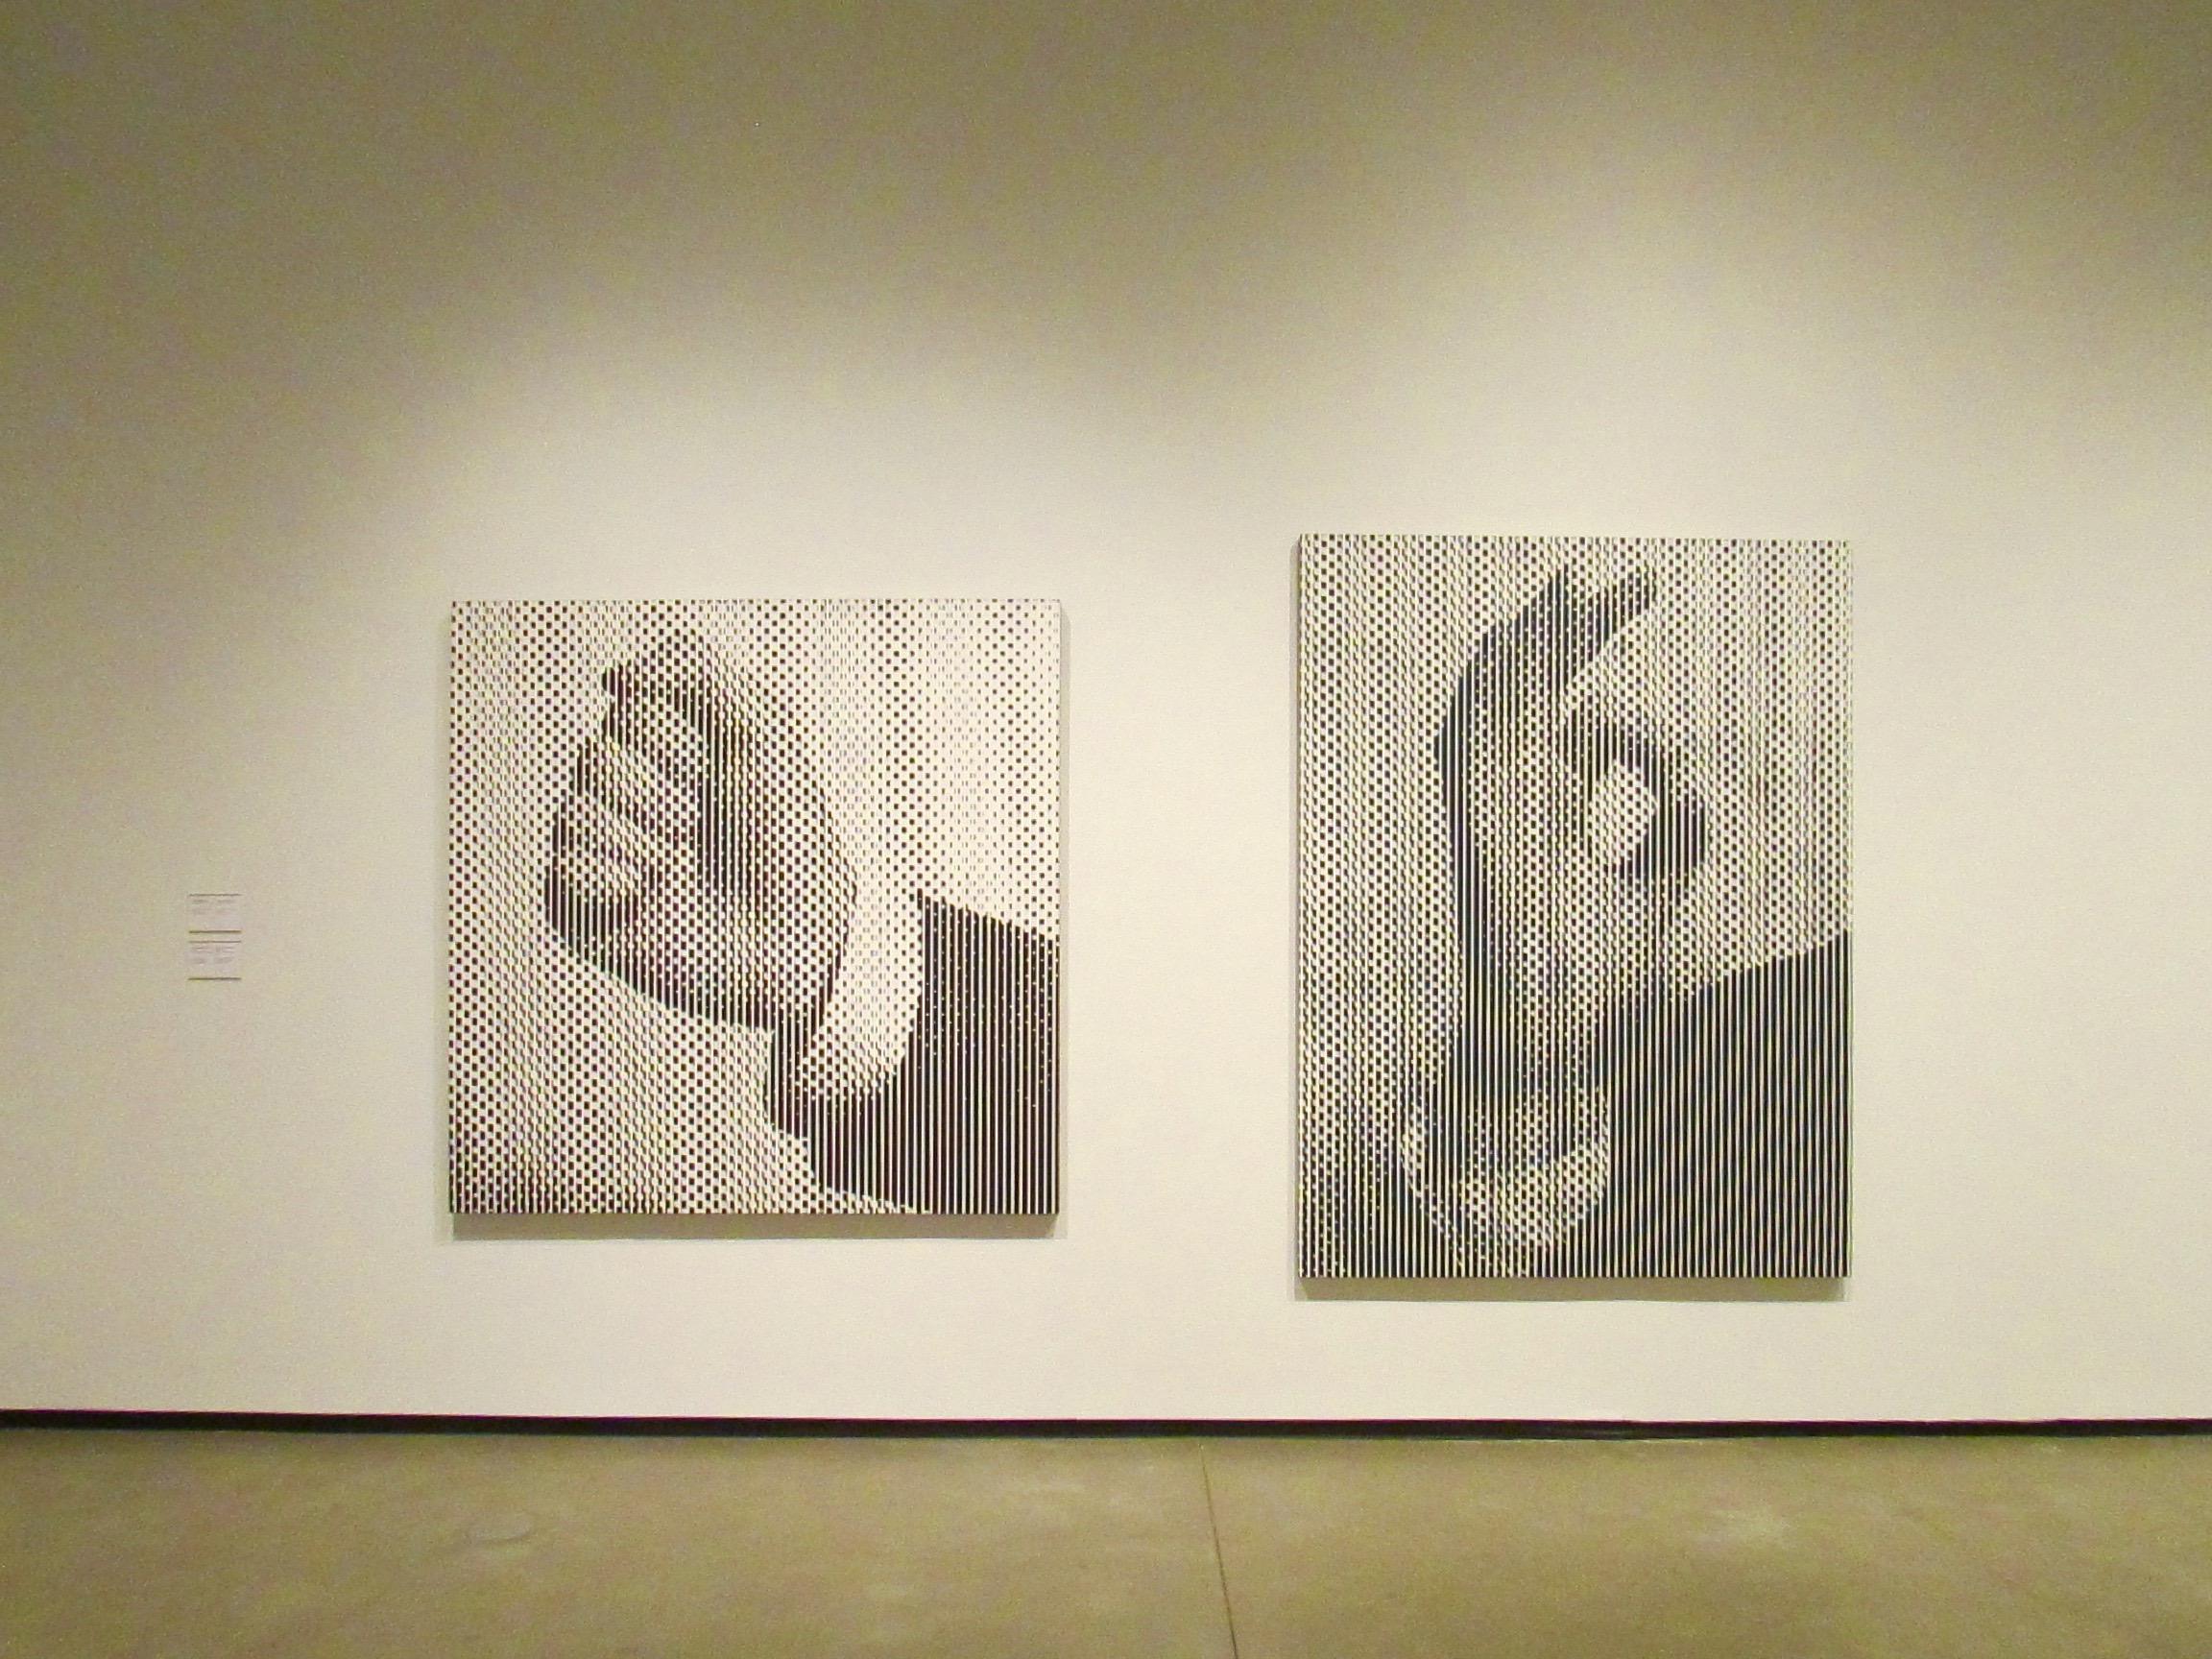 Hand Gesture , 1992;  Hand Gesture #6 (OK) , 1992